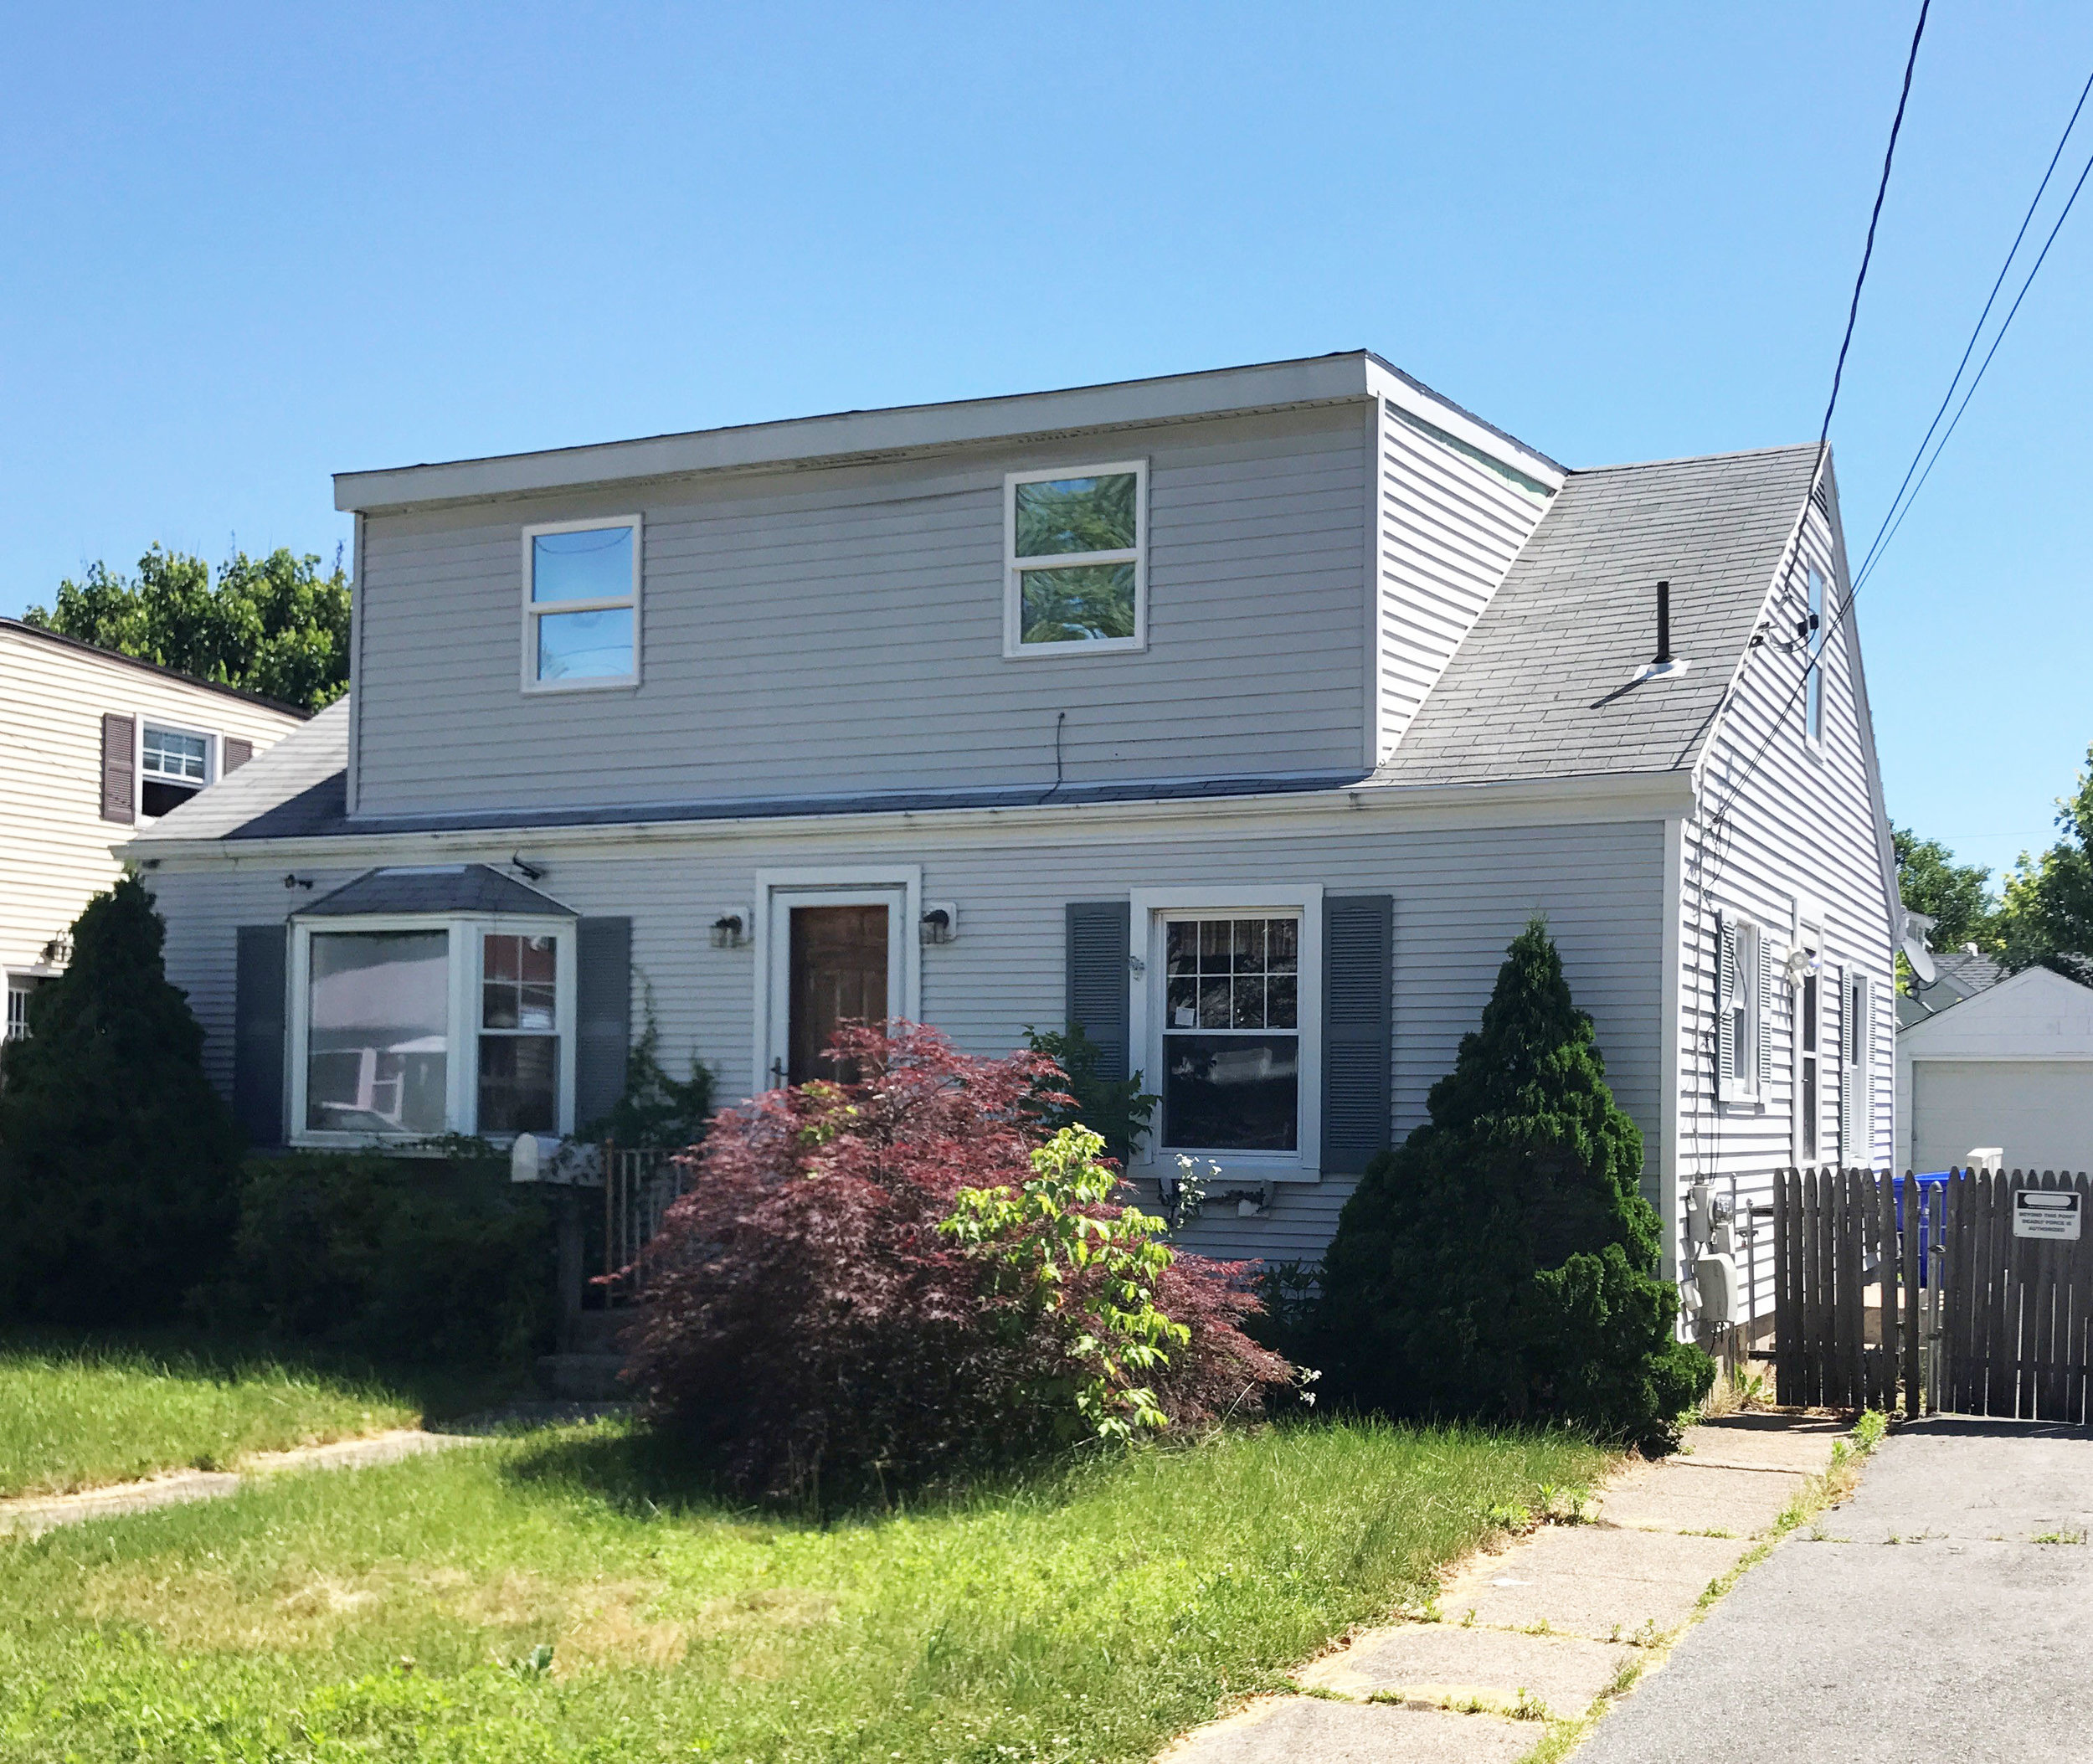 Pawtucket, RI - Closed July 12, 2017